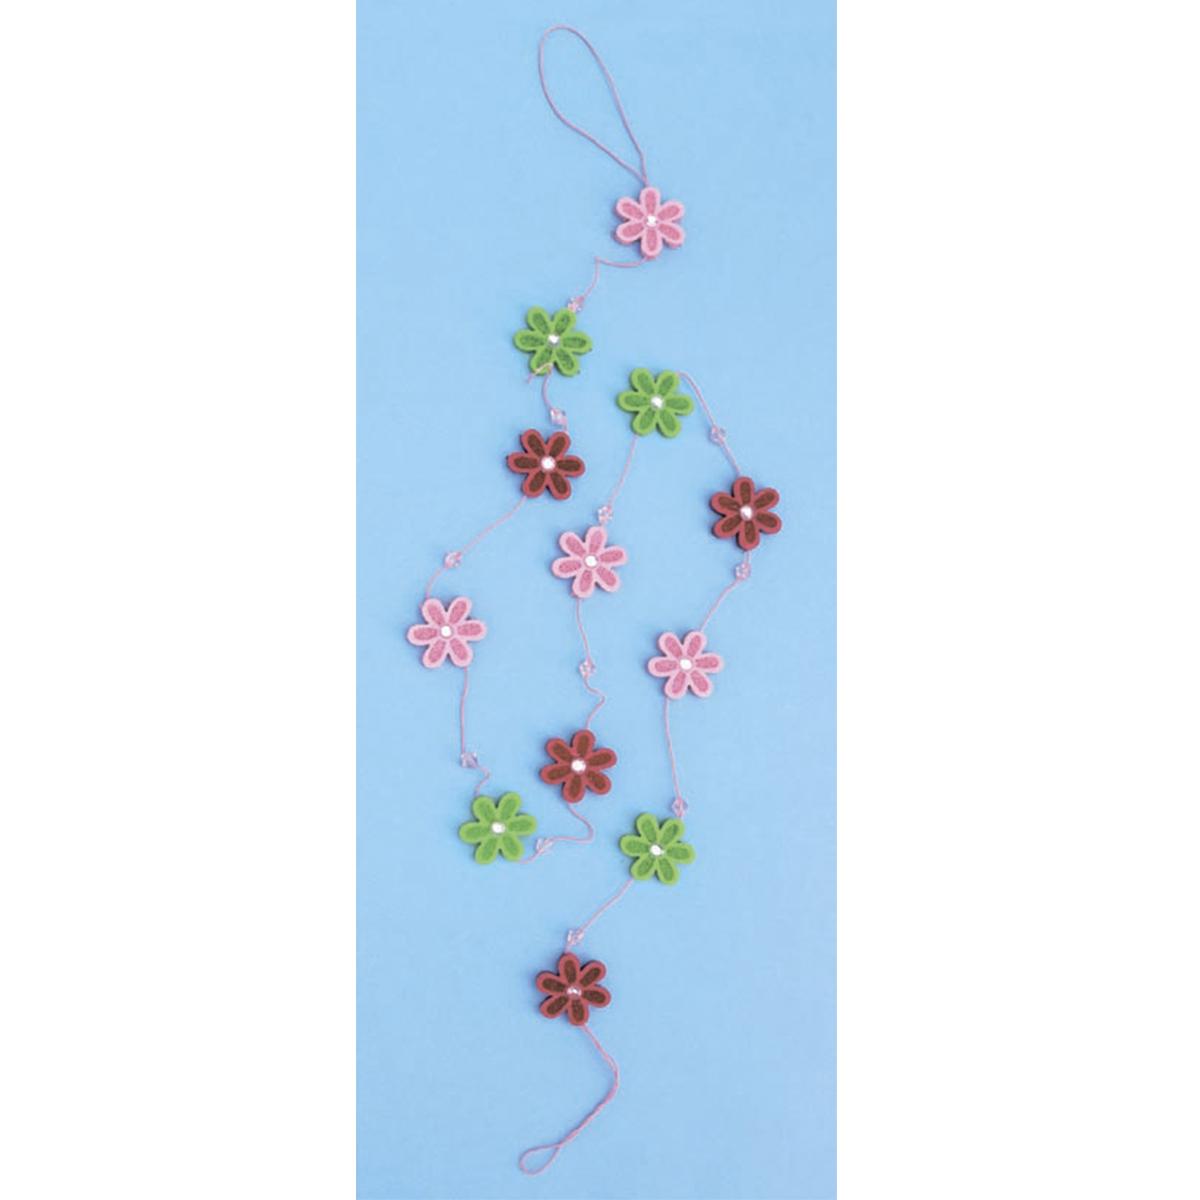 Гирлянда из цветов из фетра Glorex, 117 x 3 см318828